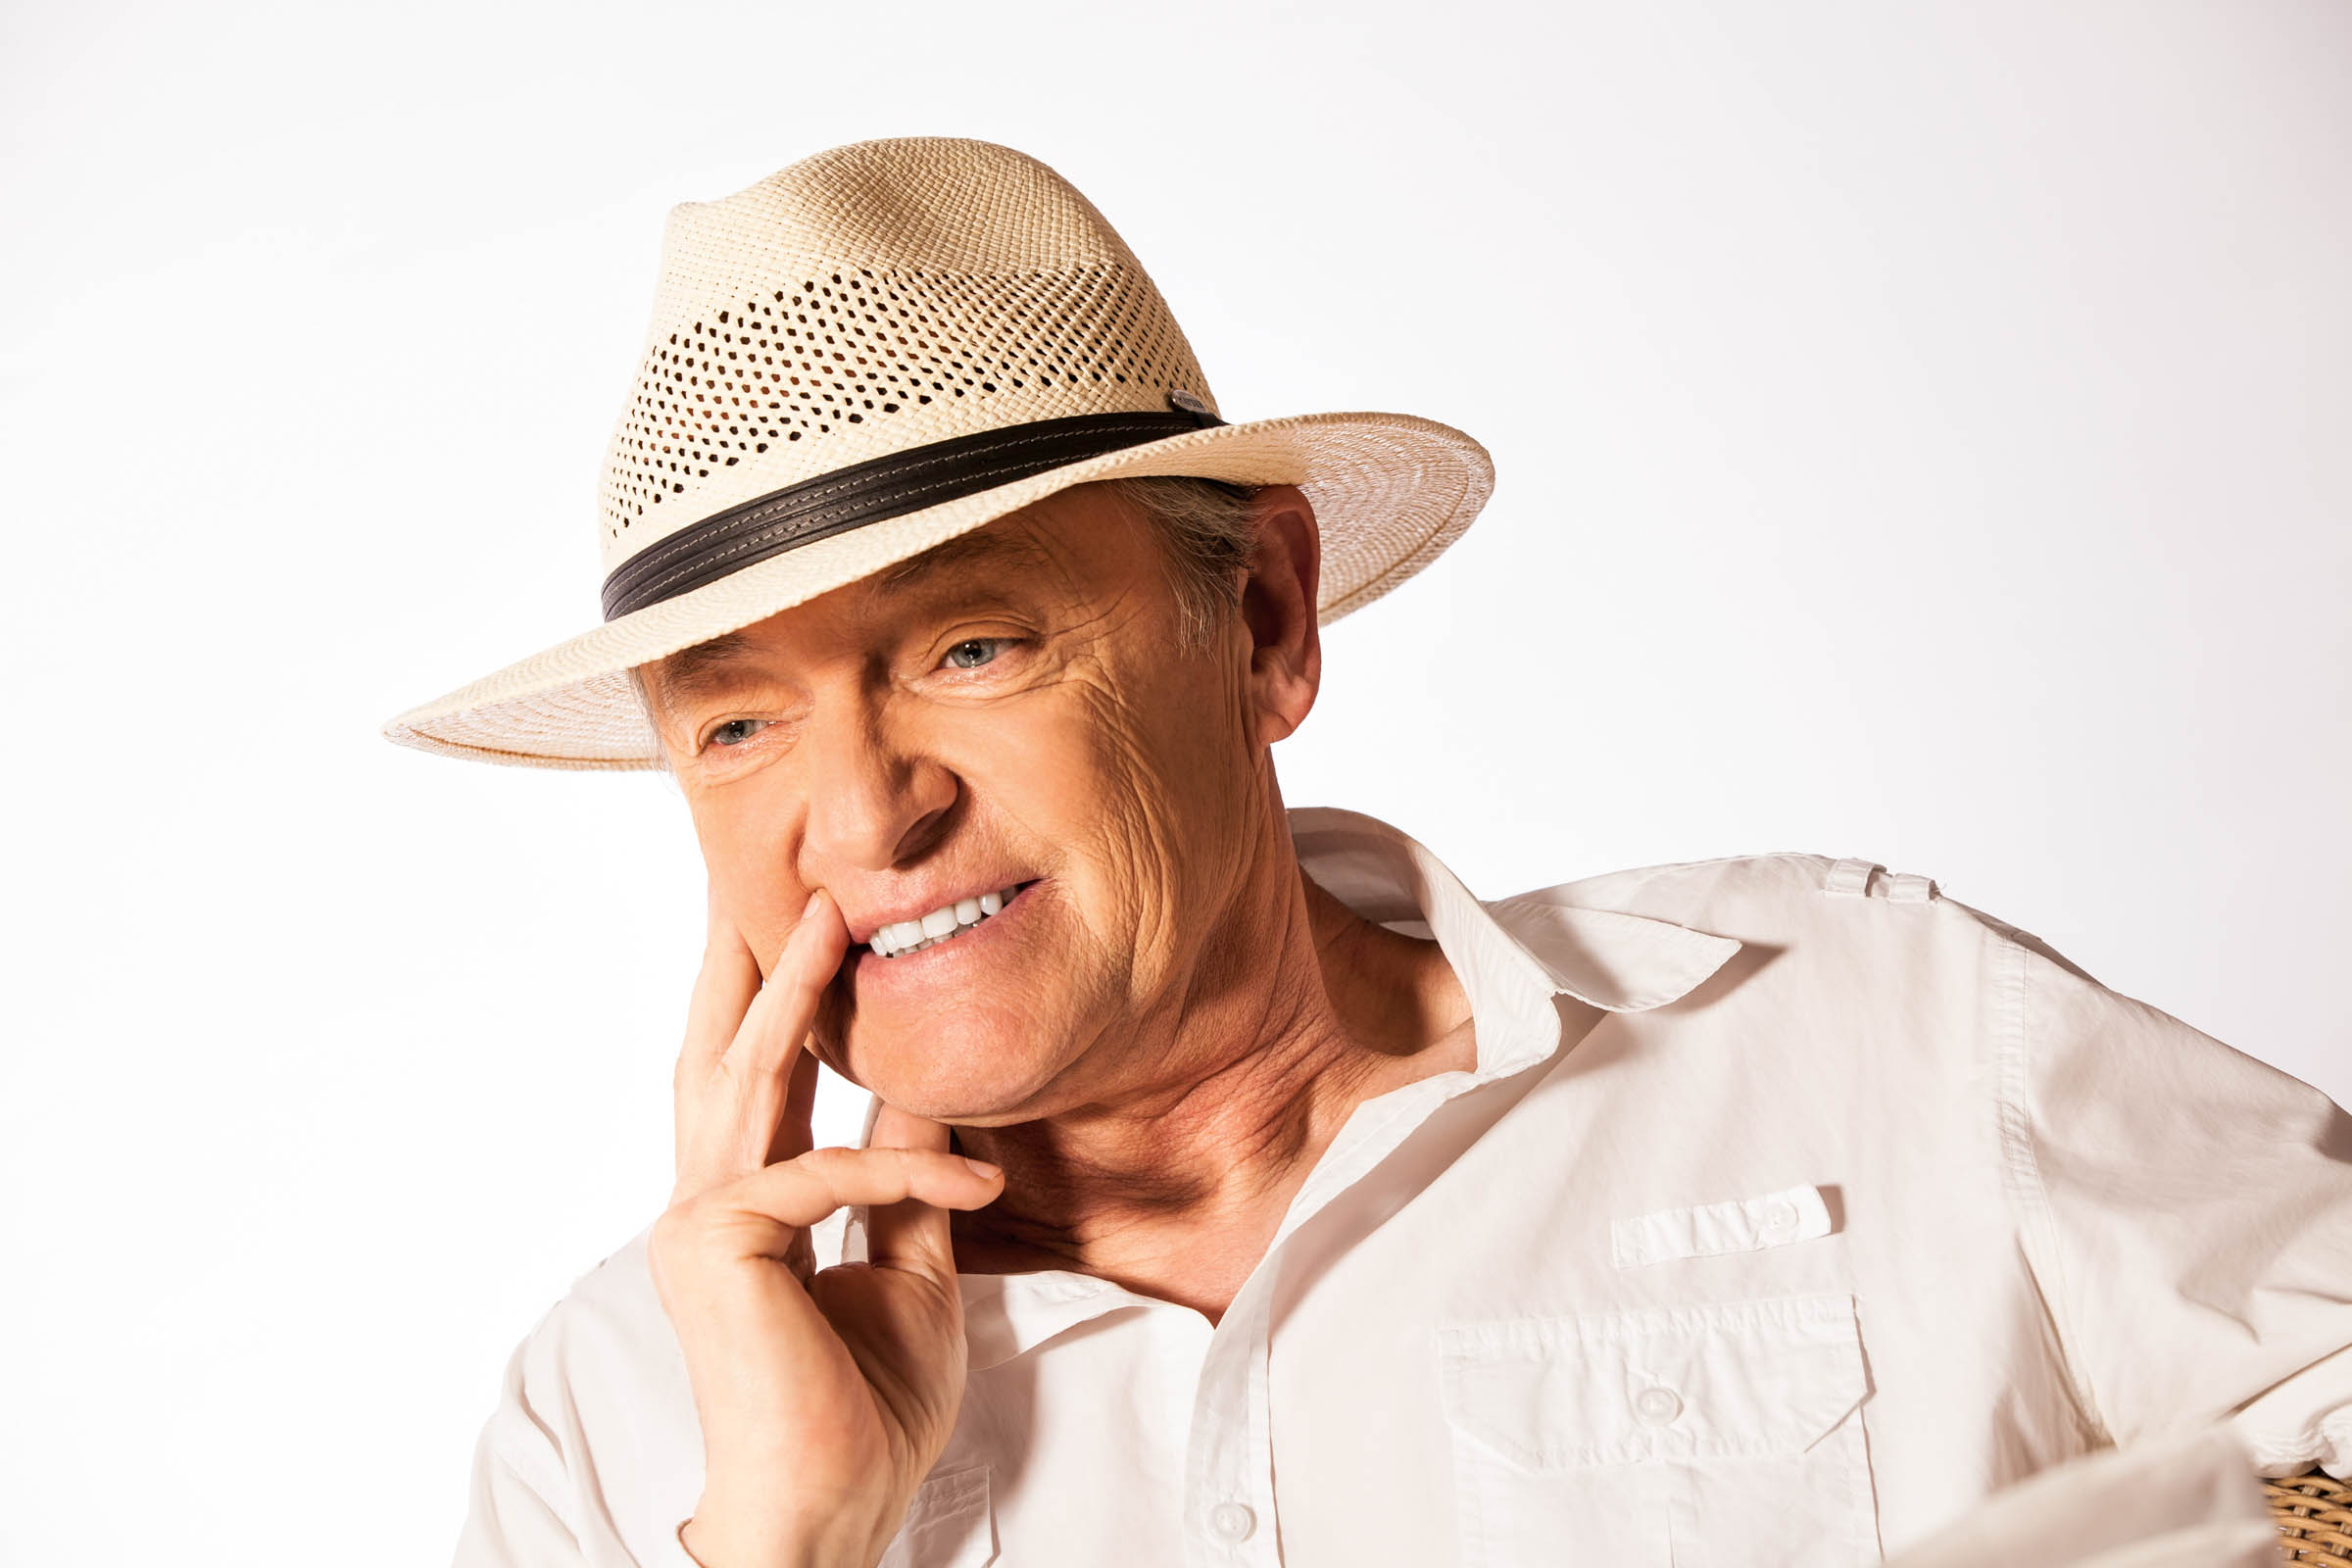 Mayser - reklamná fashion fotografia - portrét v klobúku